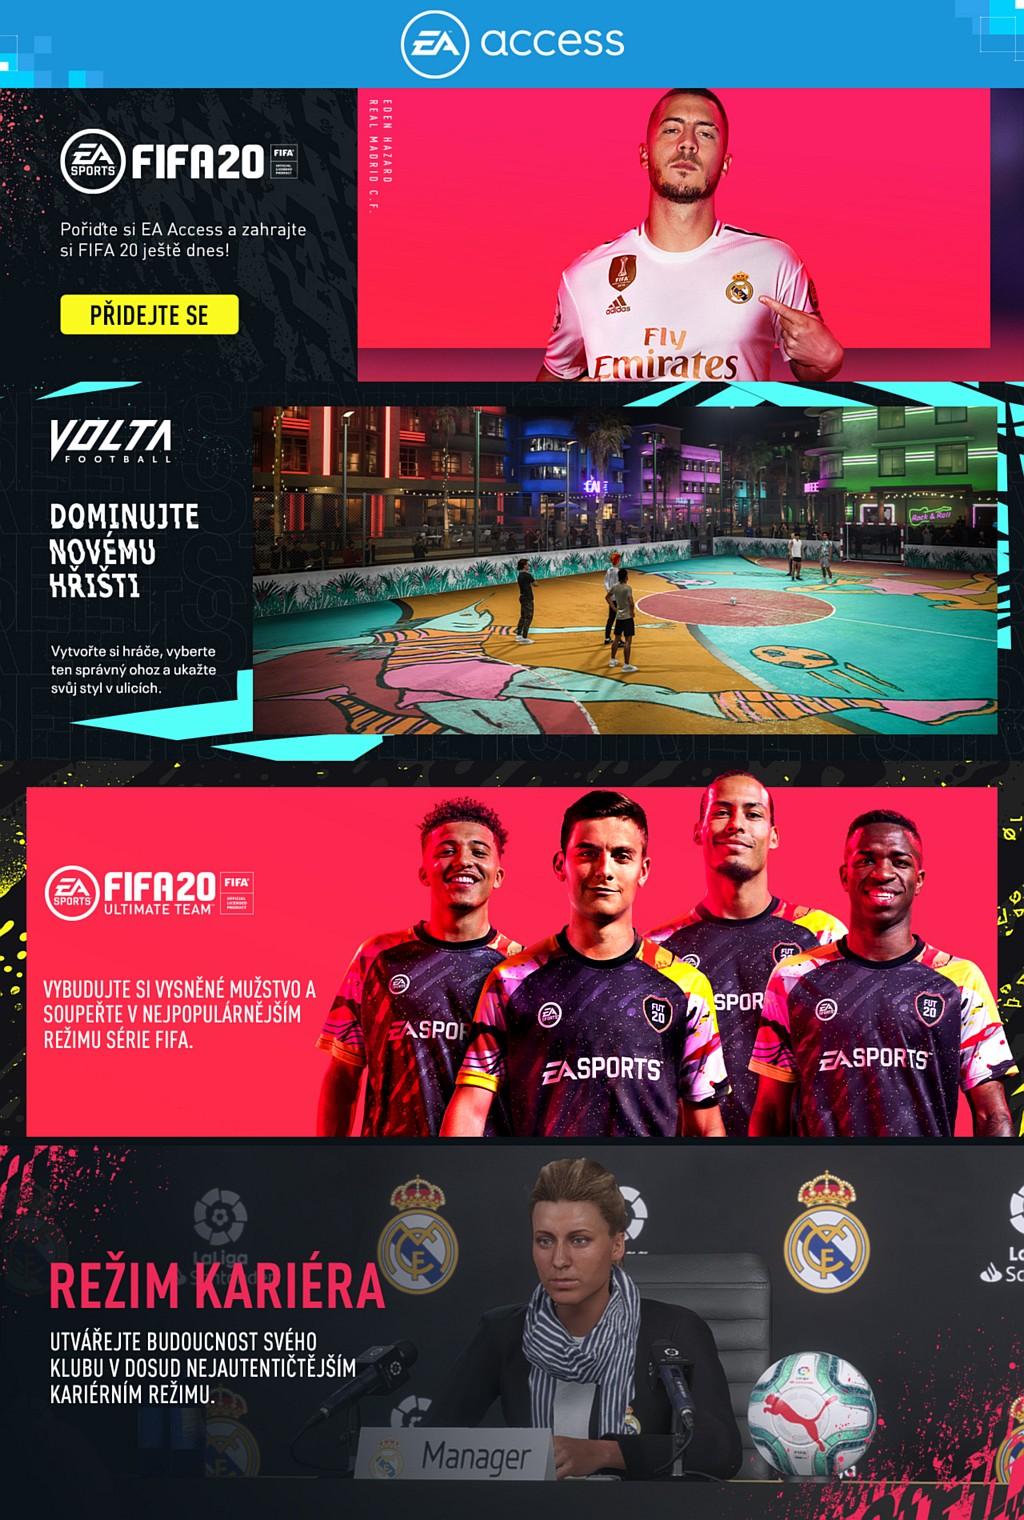 FIFA 20 nově součástí EA Access/Origin fifa20eavault